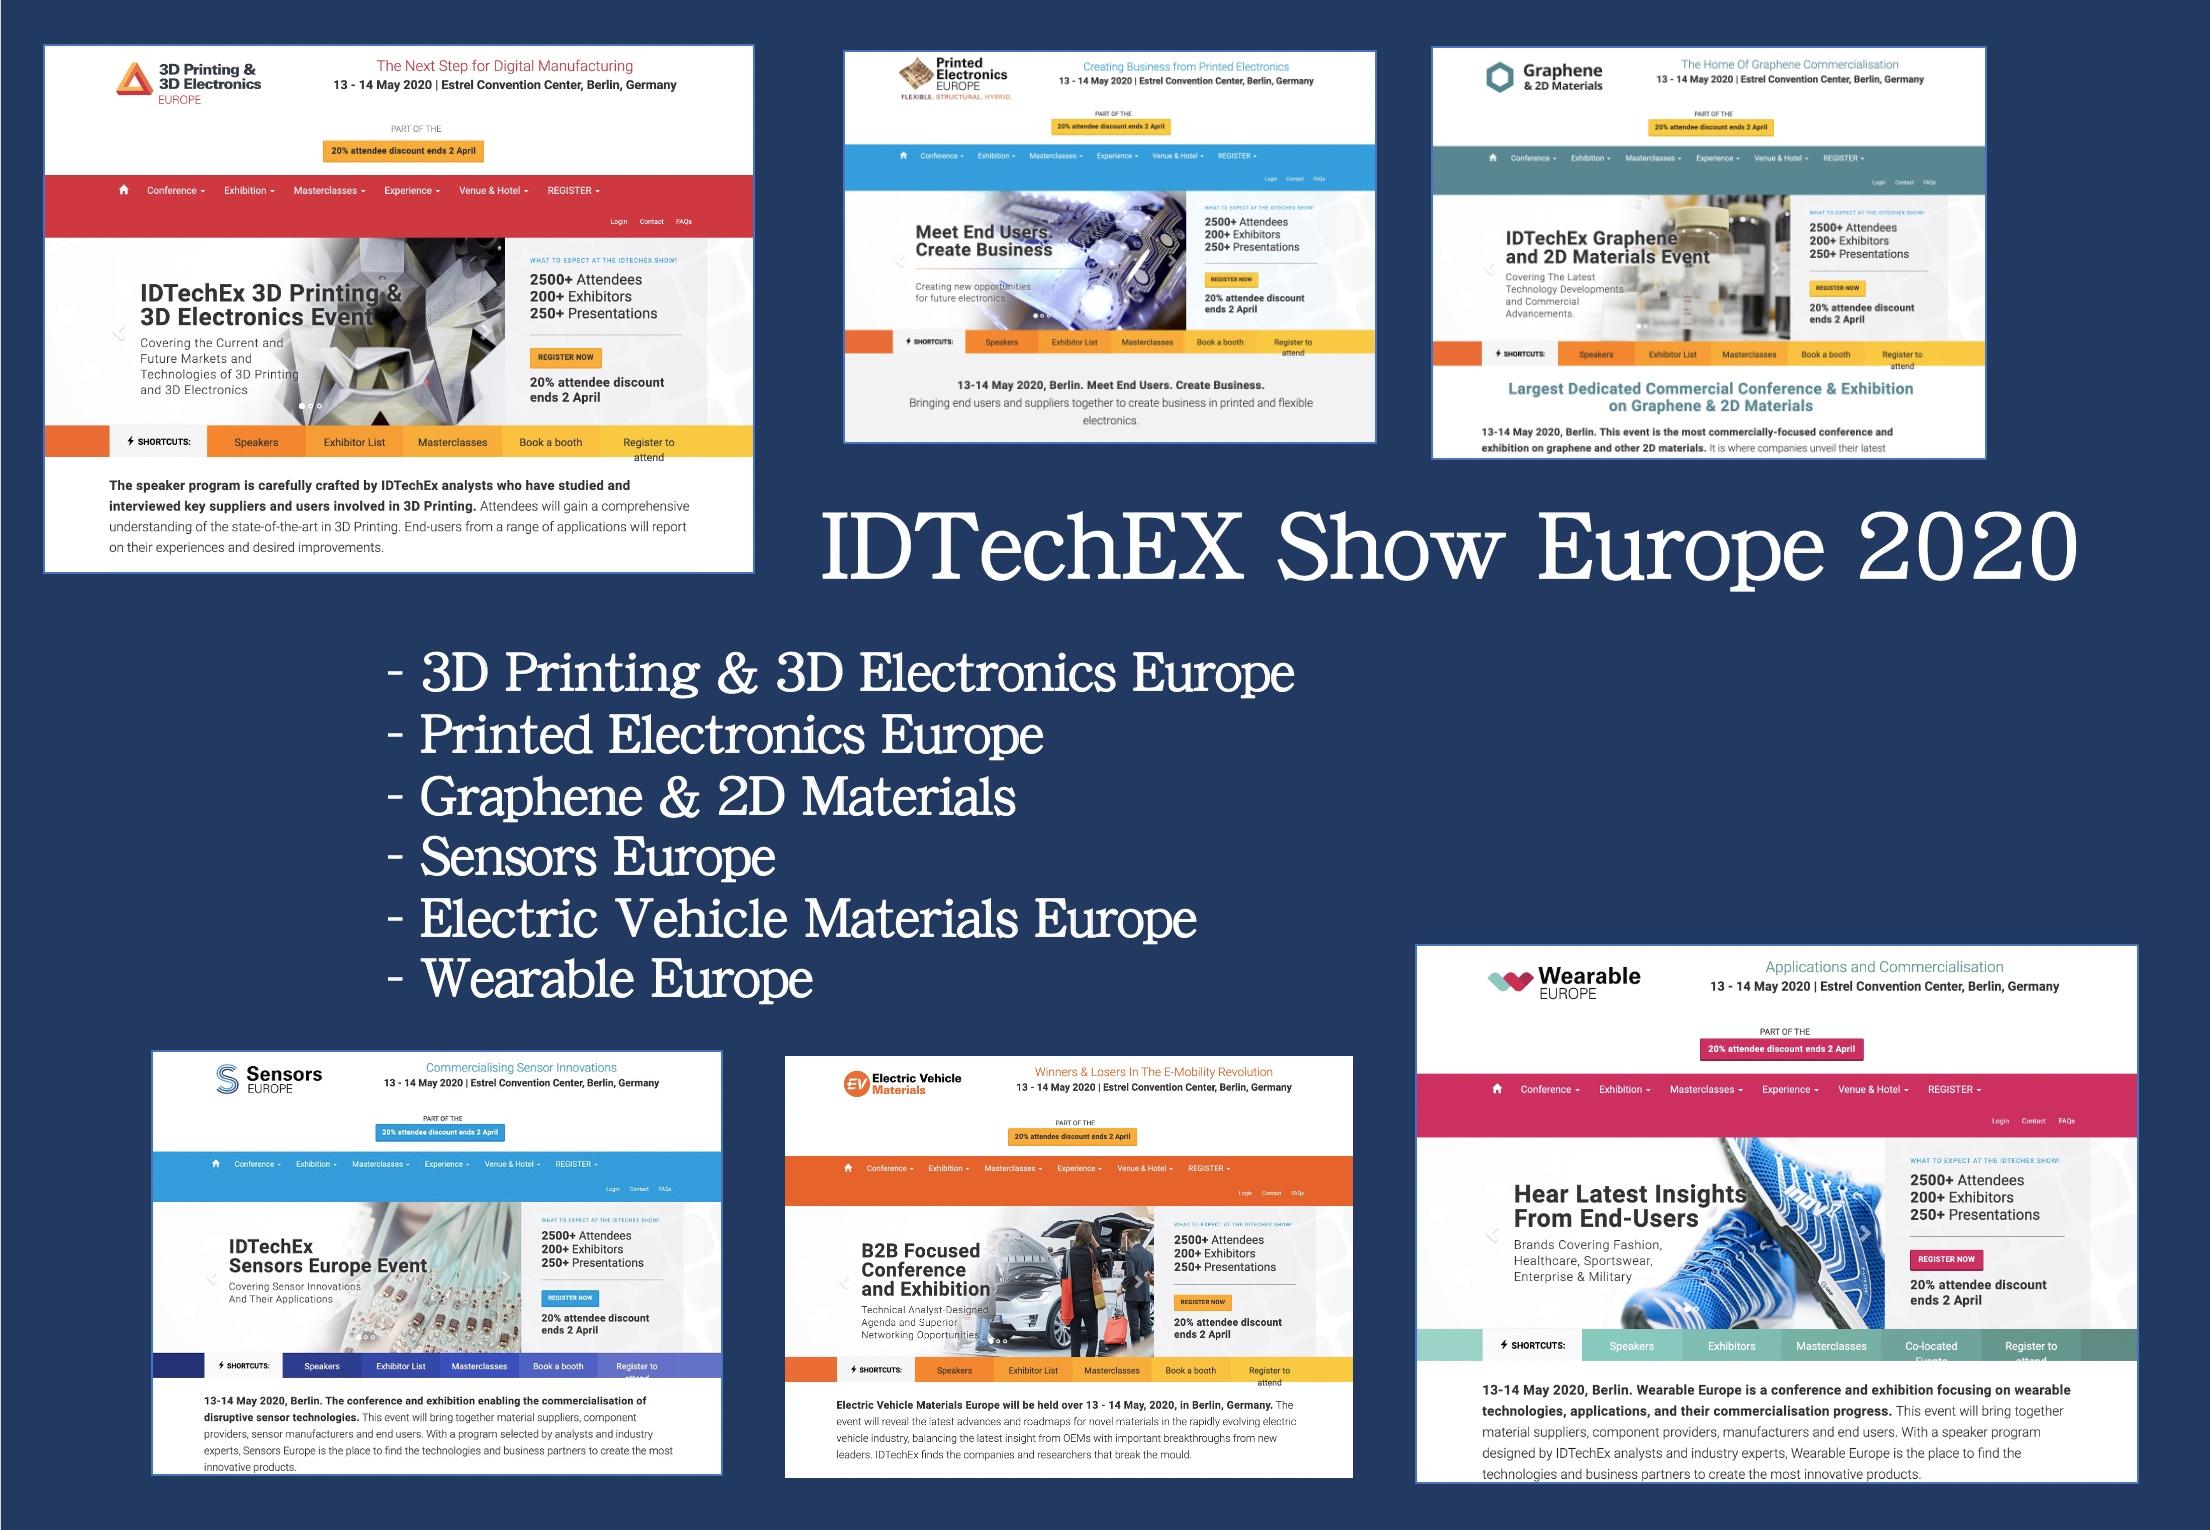 IDTechEX Show Europe